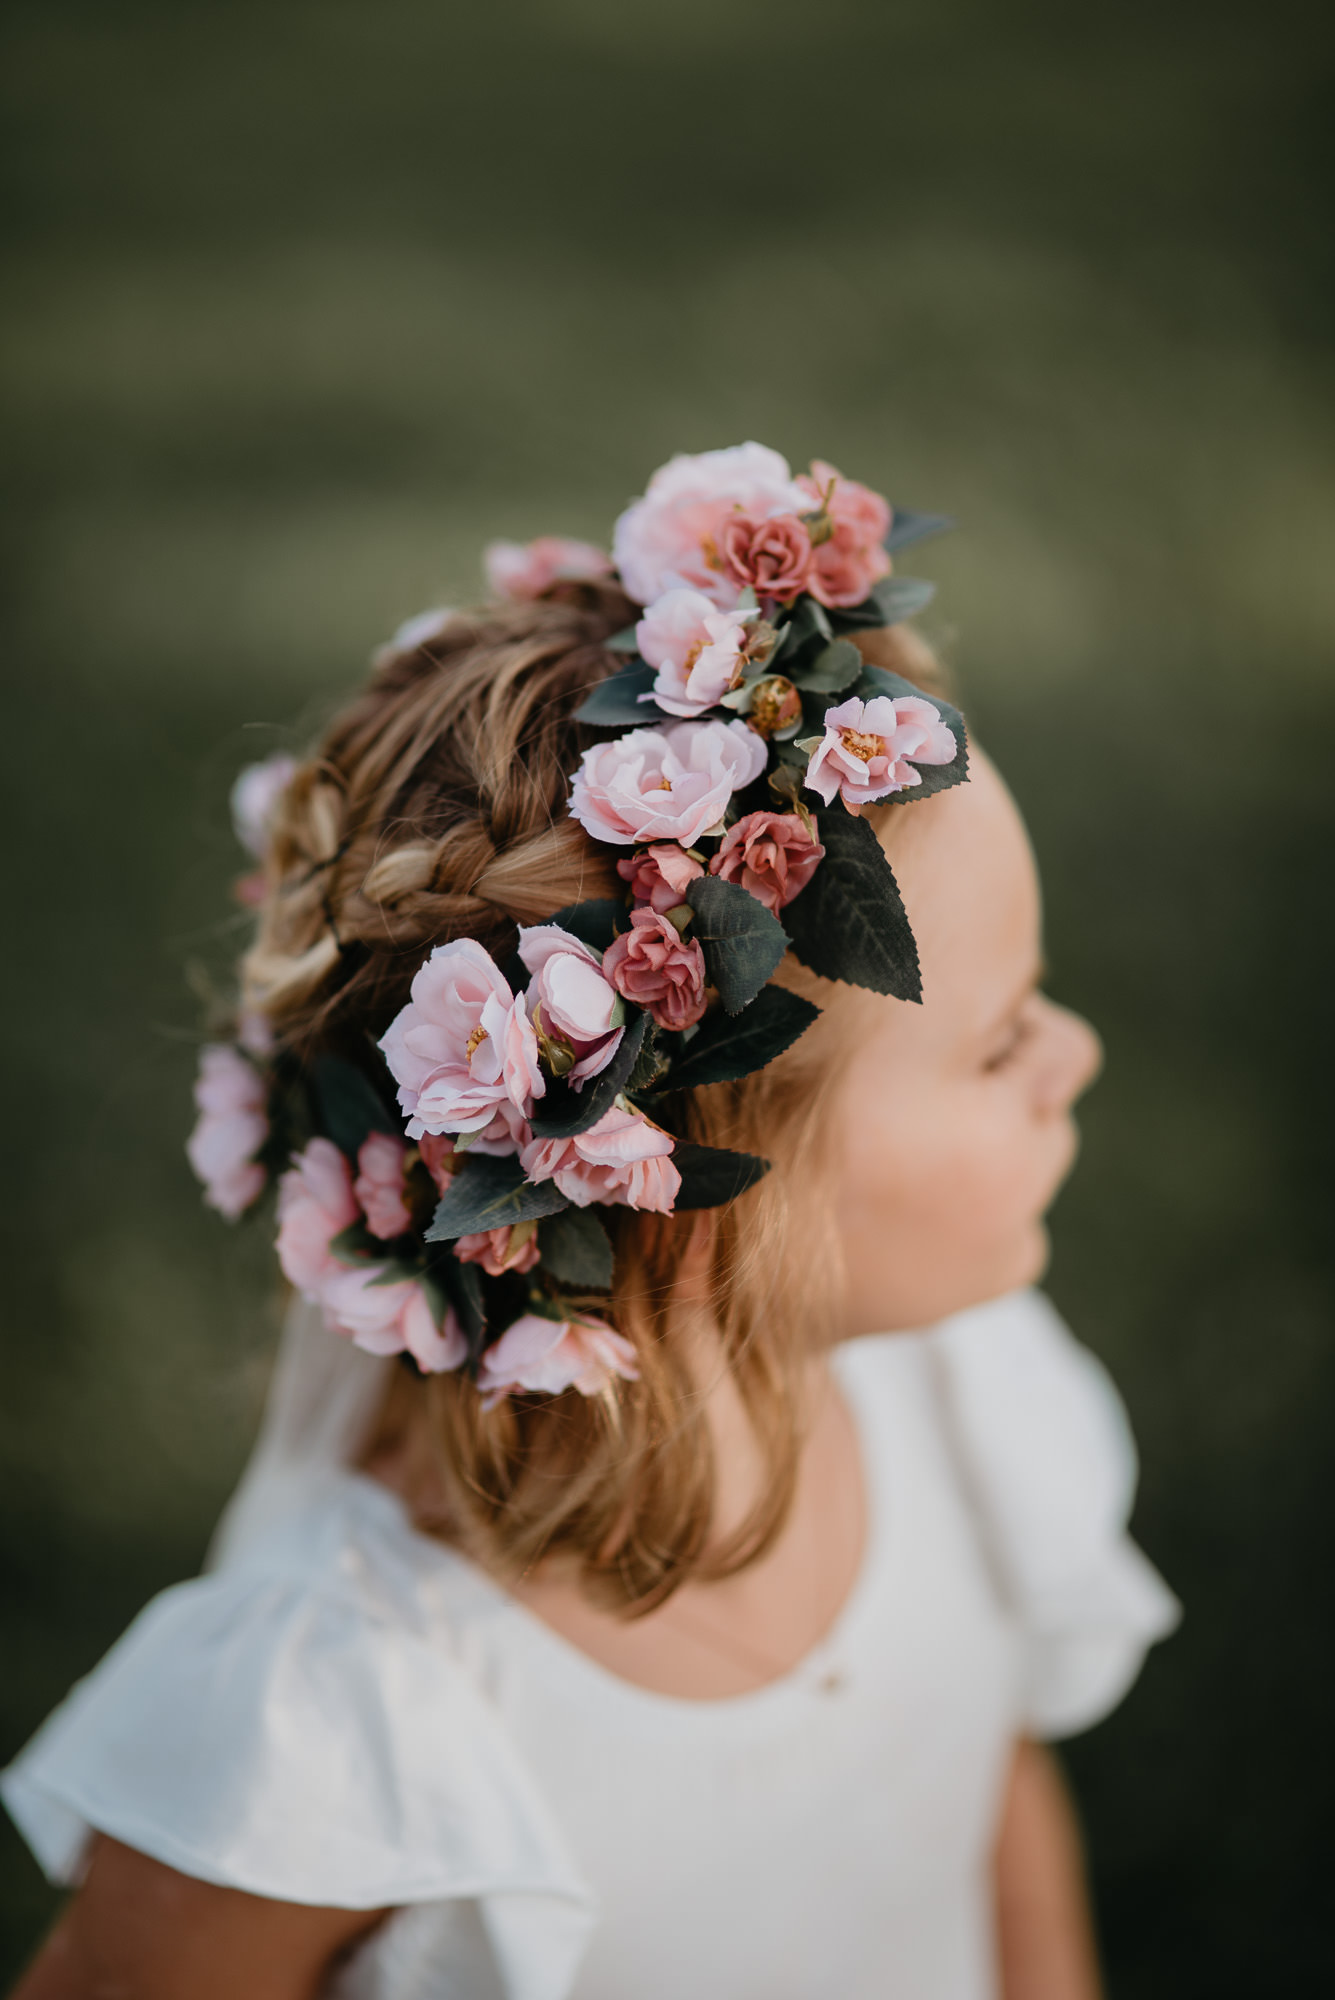 Doe Creek Farm - Weddings - Virginia - Best Wedding Photographer - Pat Cori Photography-39.jpg